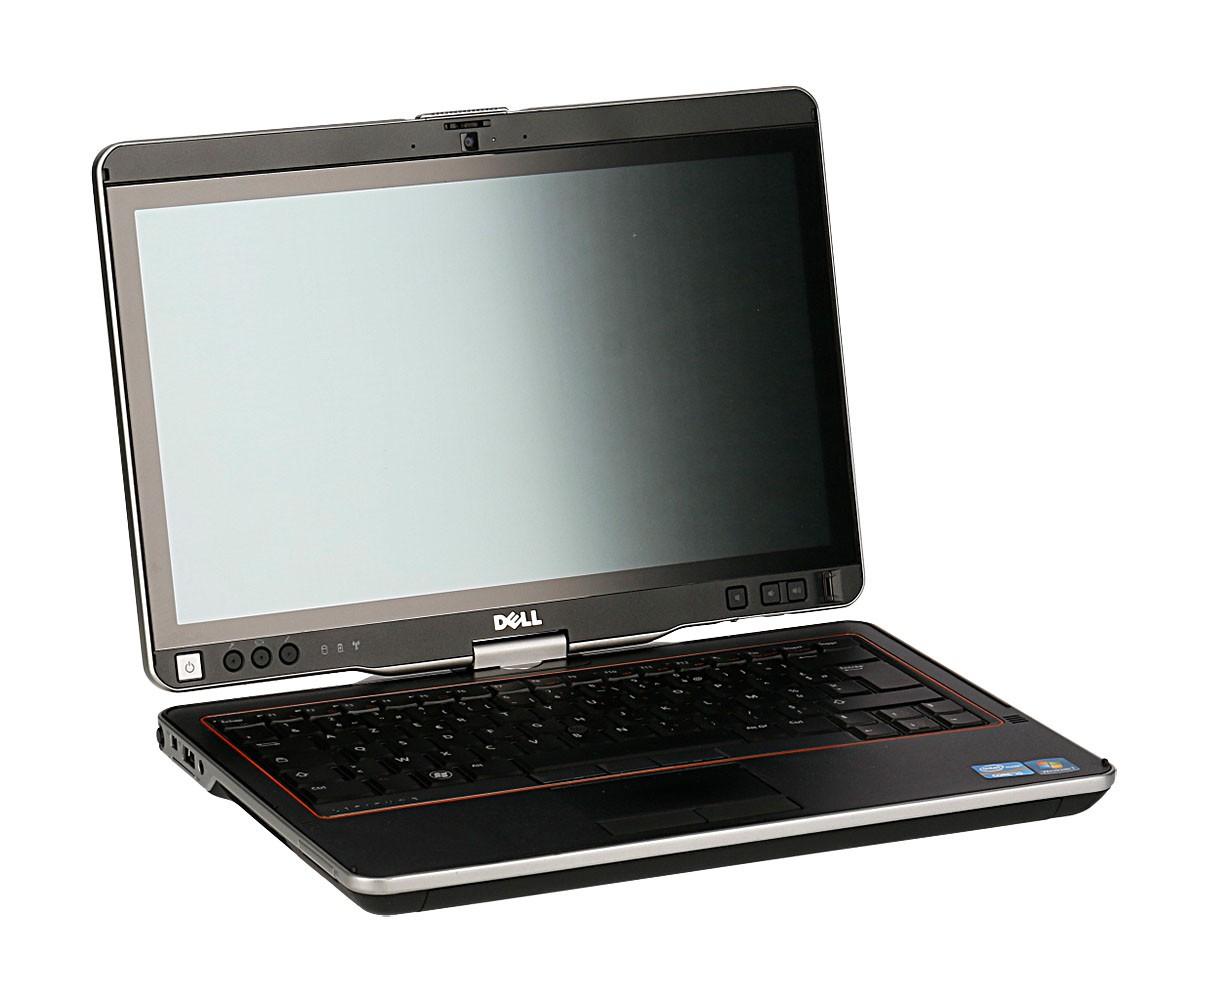 "DELL Latitude XT3 - i5-2520M 2,50 GHz - 4 GB RAM - 128 GB SSD - 13,3"" 1366x768 - Win 7 (->10) [B-Ware]"